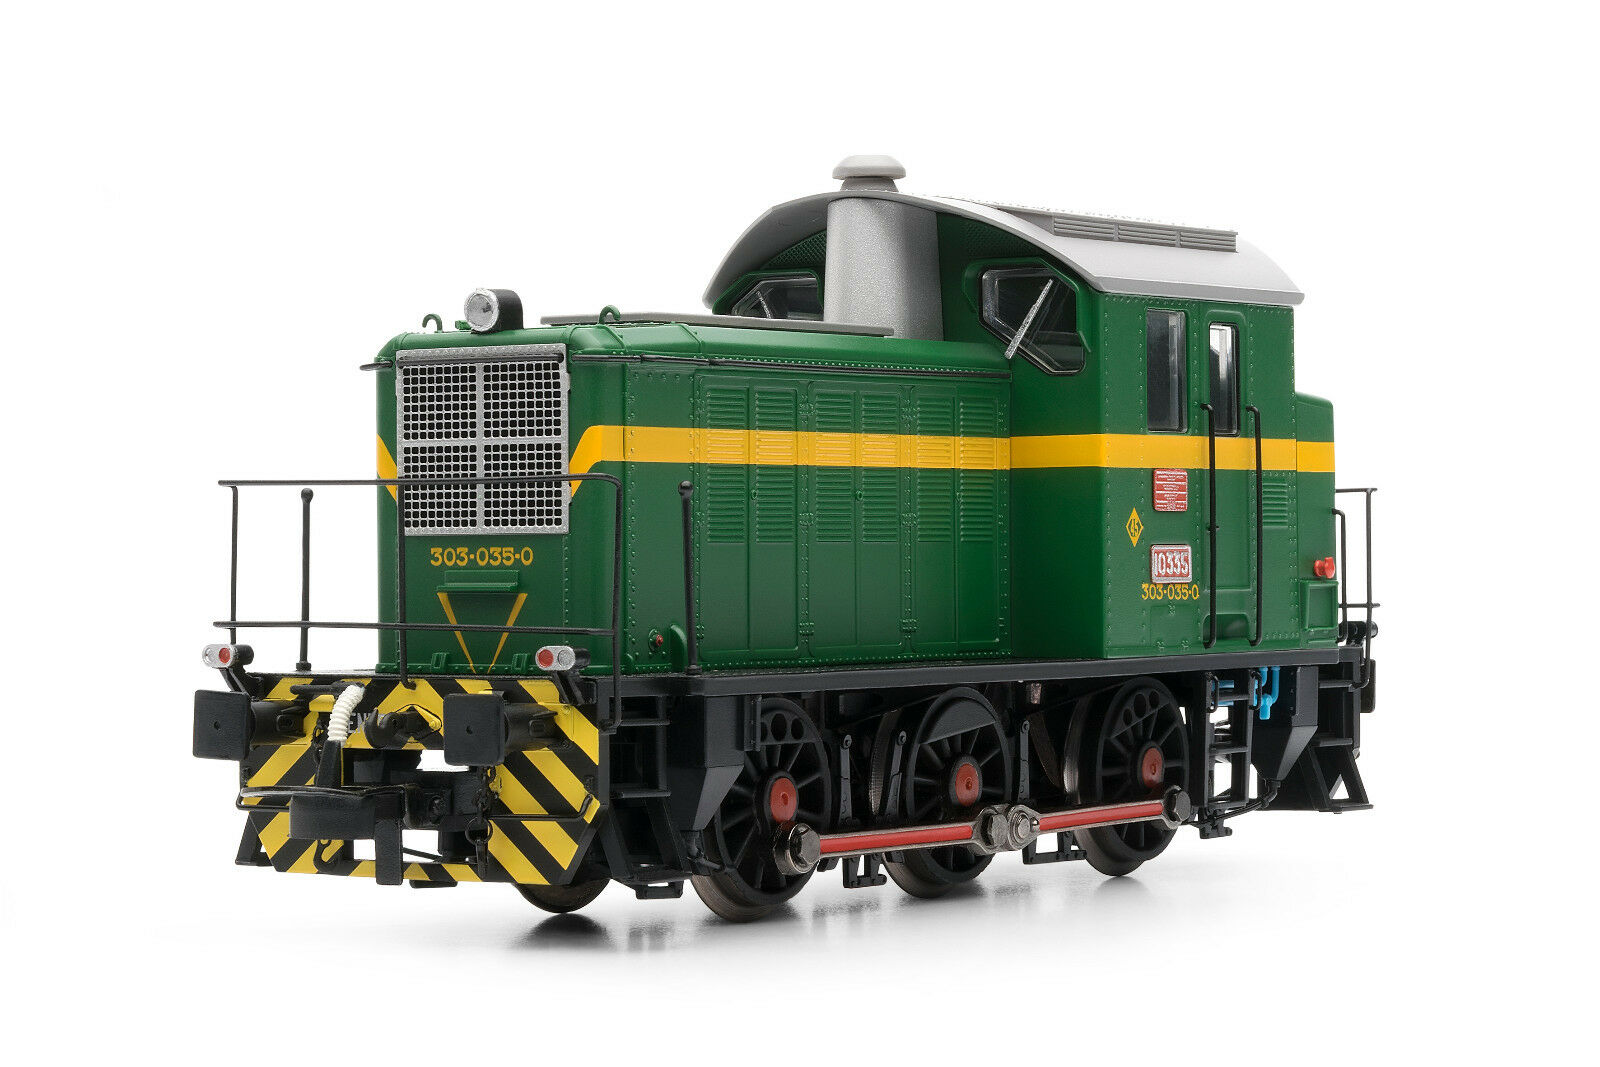 Electrojoren e3810 diesel locomotora diesel Renfe 303.035 verde y amarillo EP. IV